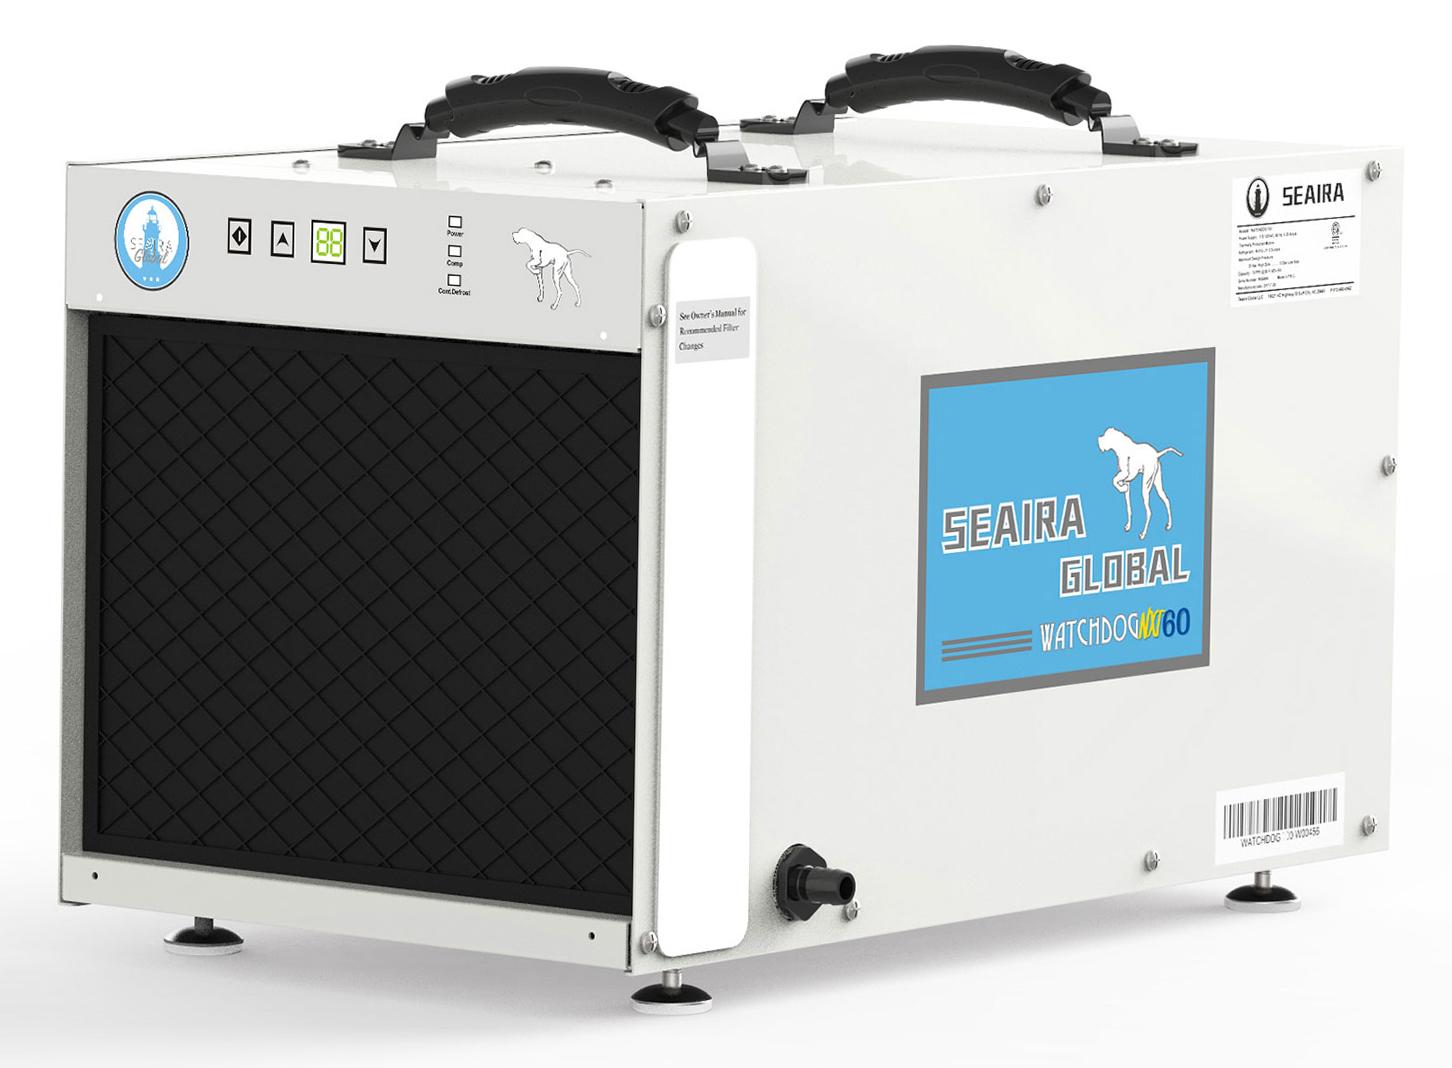 Seaira WatchDog NXT60 60 Pints Per Day Crawl Space Dehumidifier